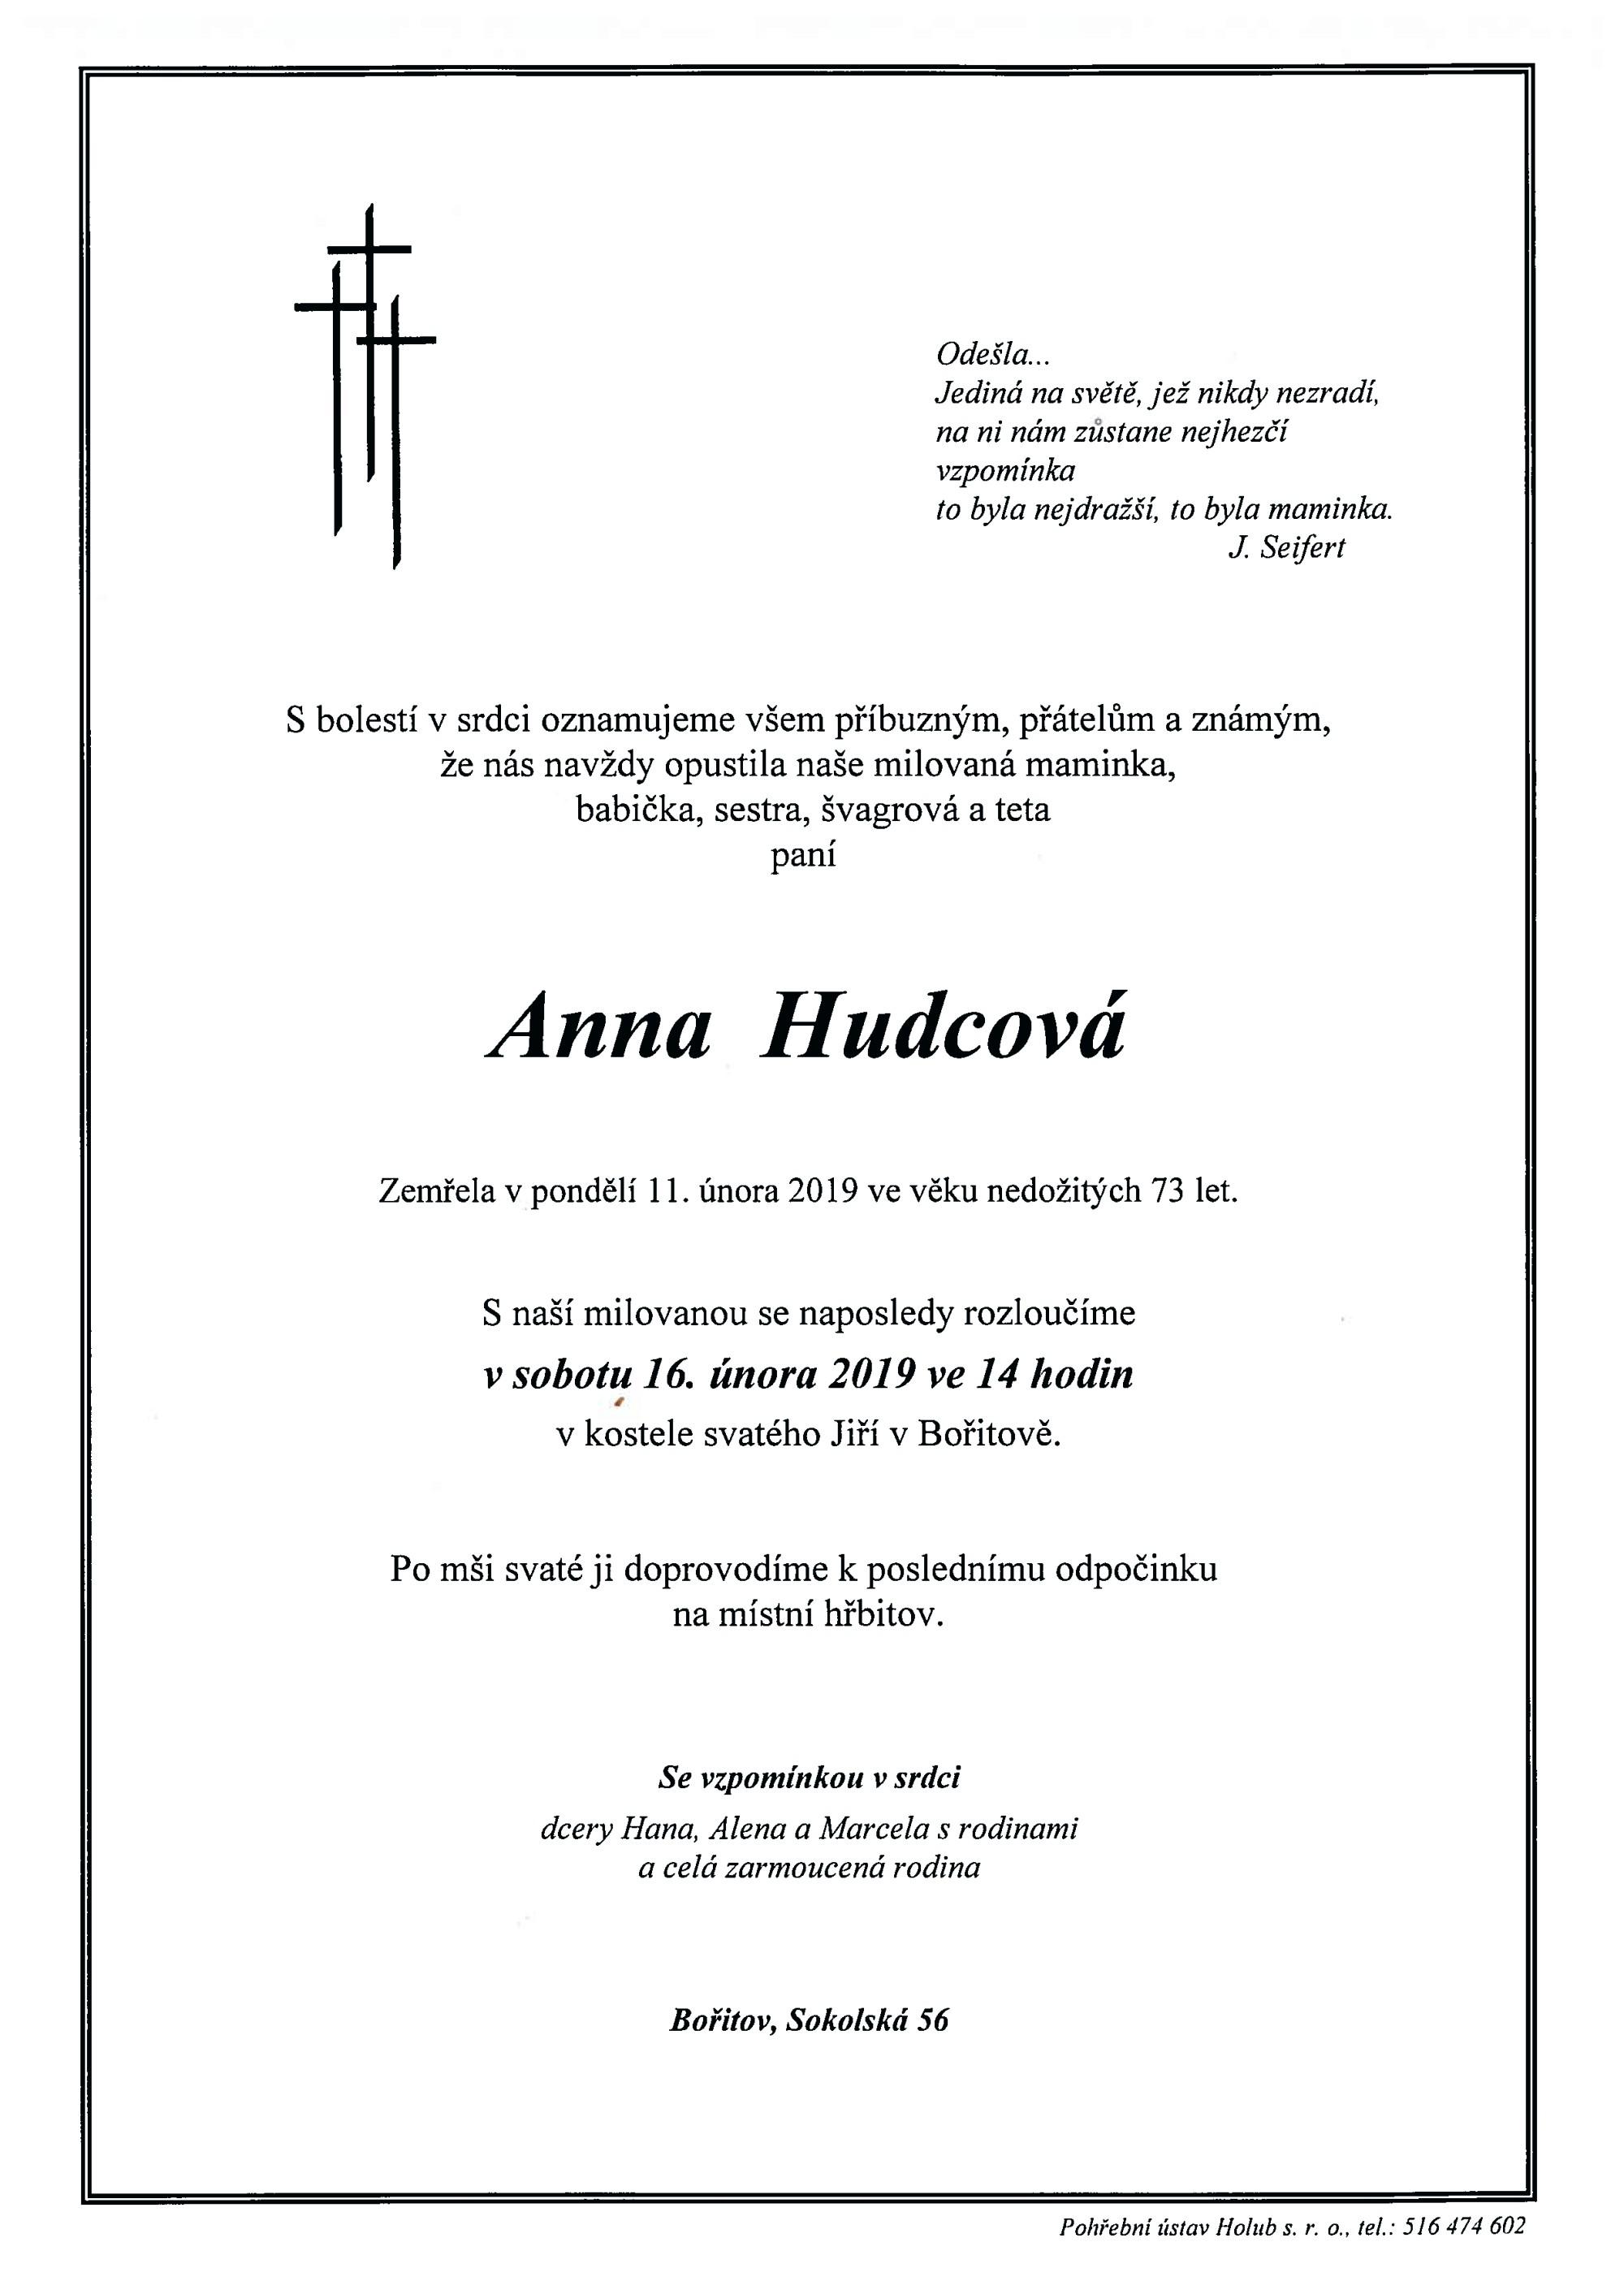 Anna Hudcová